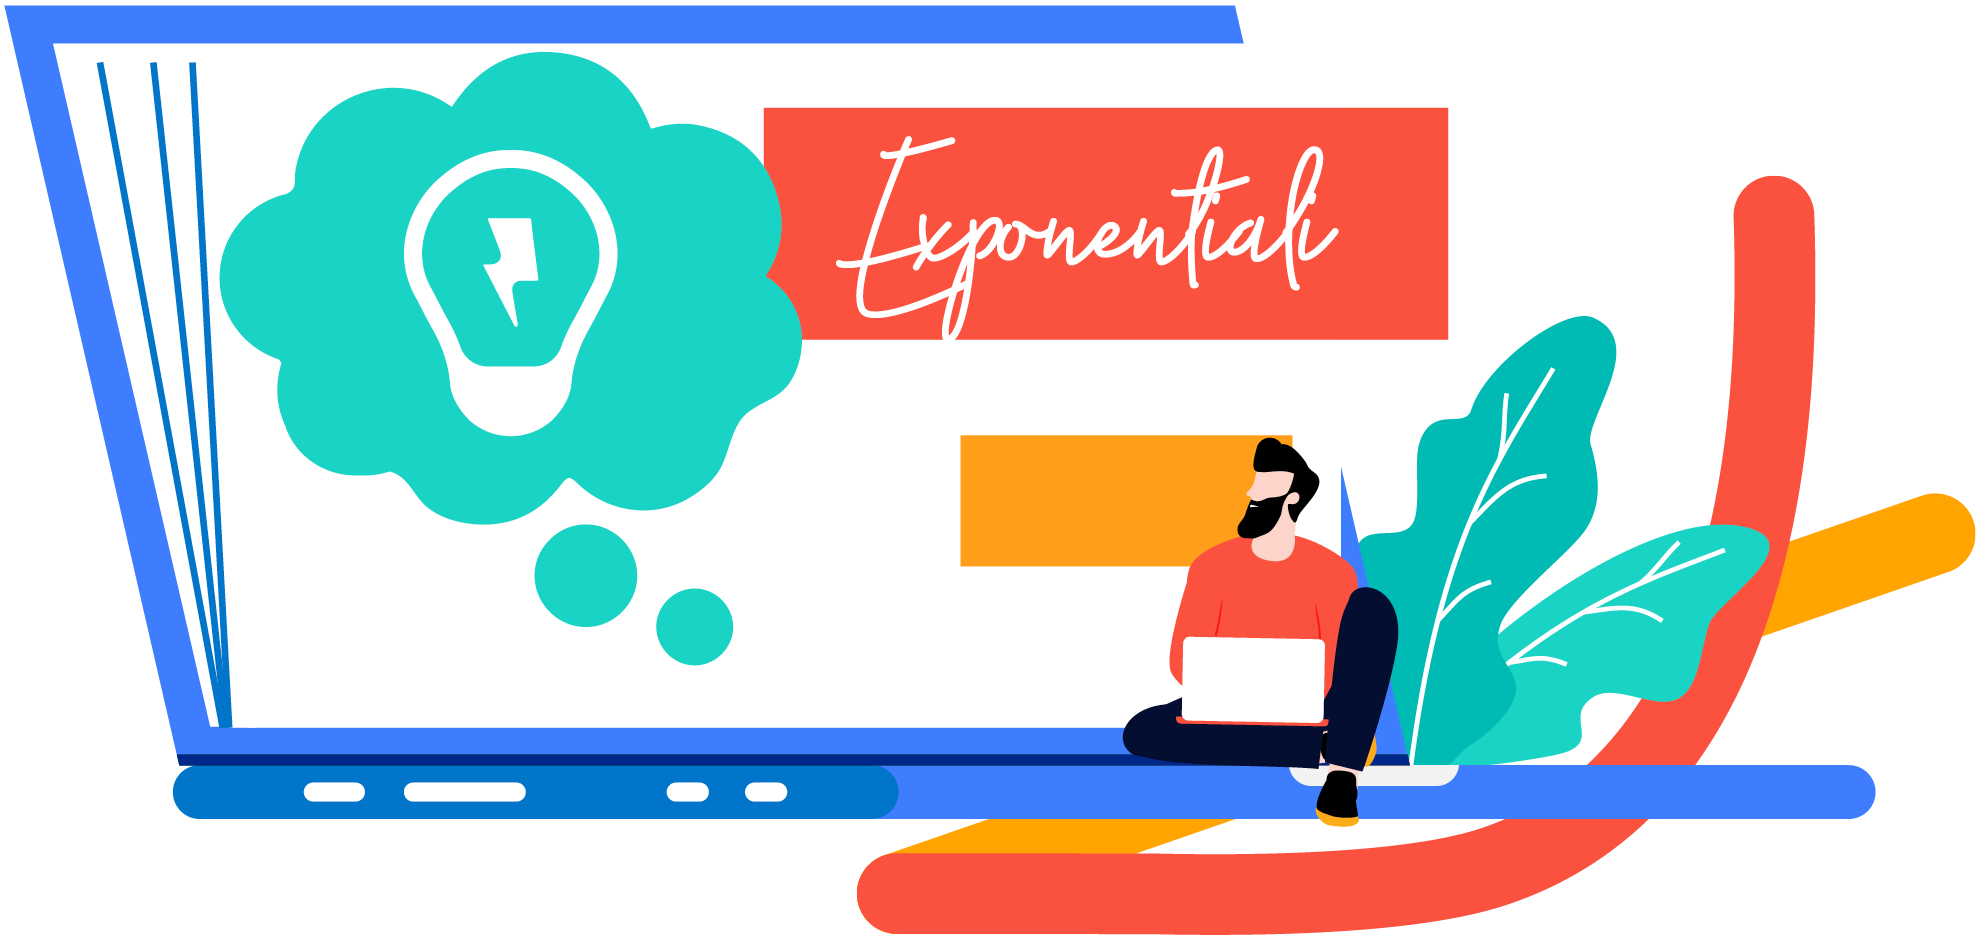 exponentiali-blog-experimentation.png